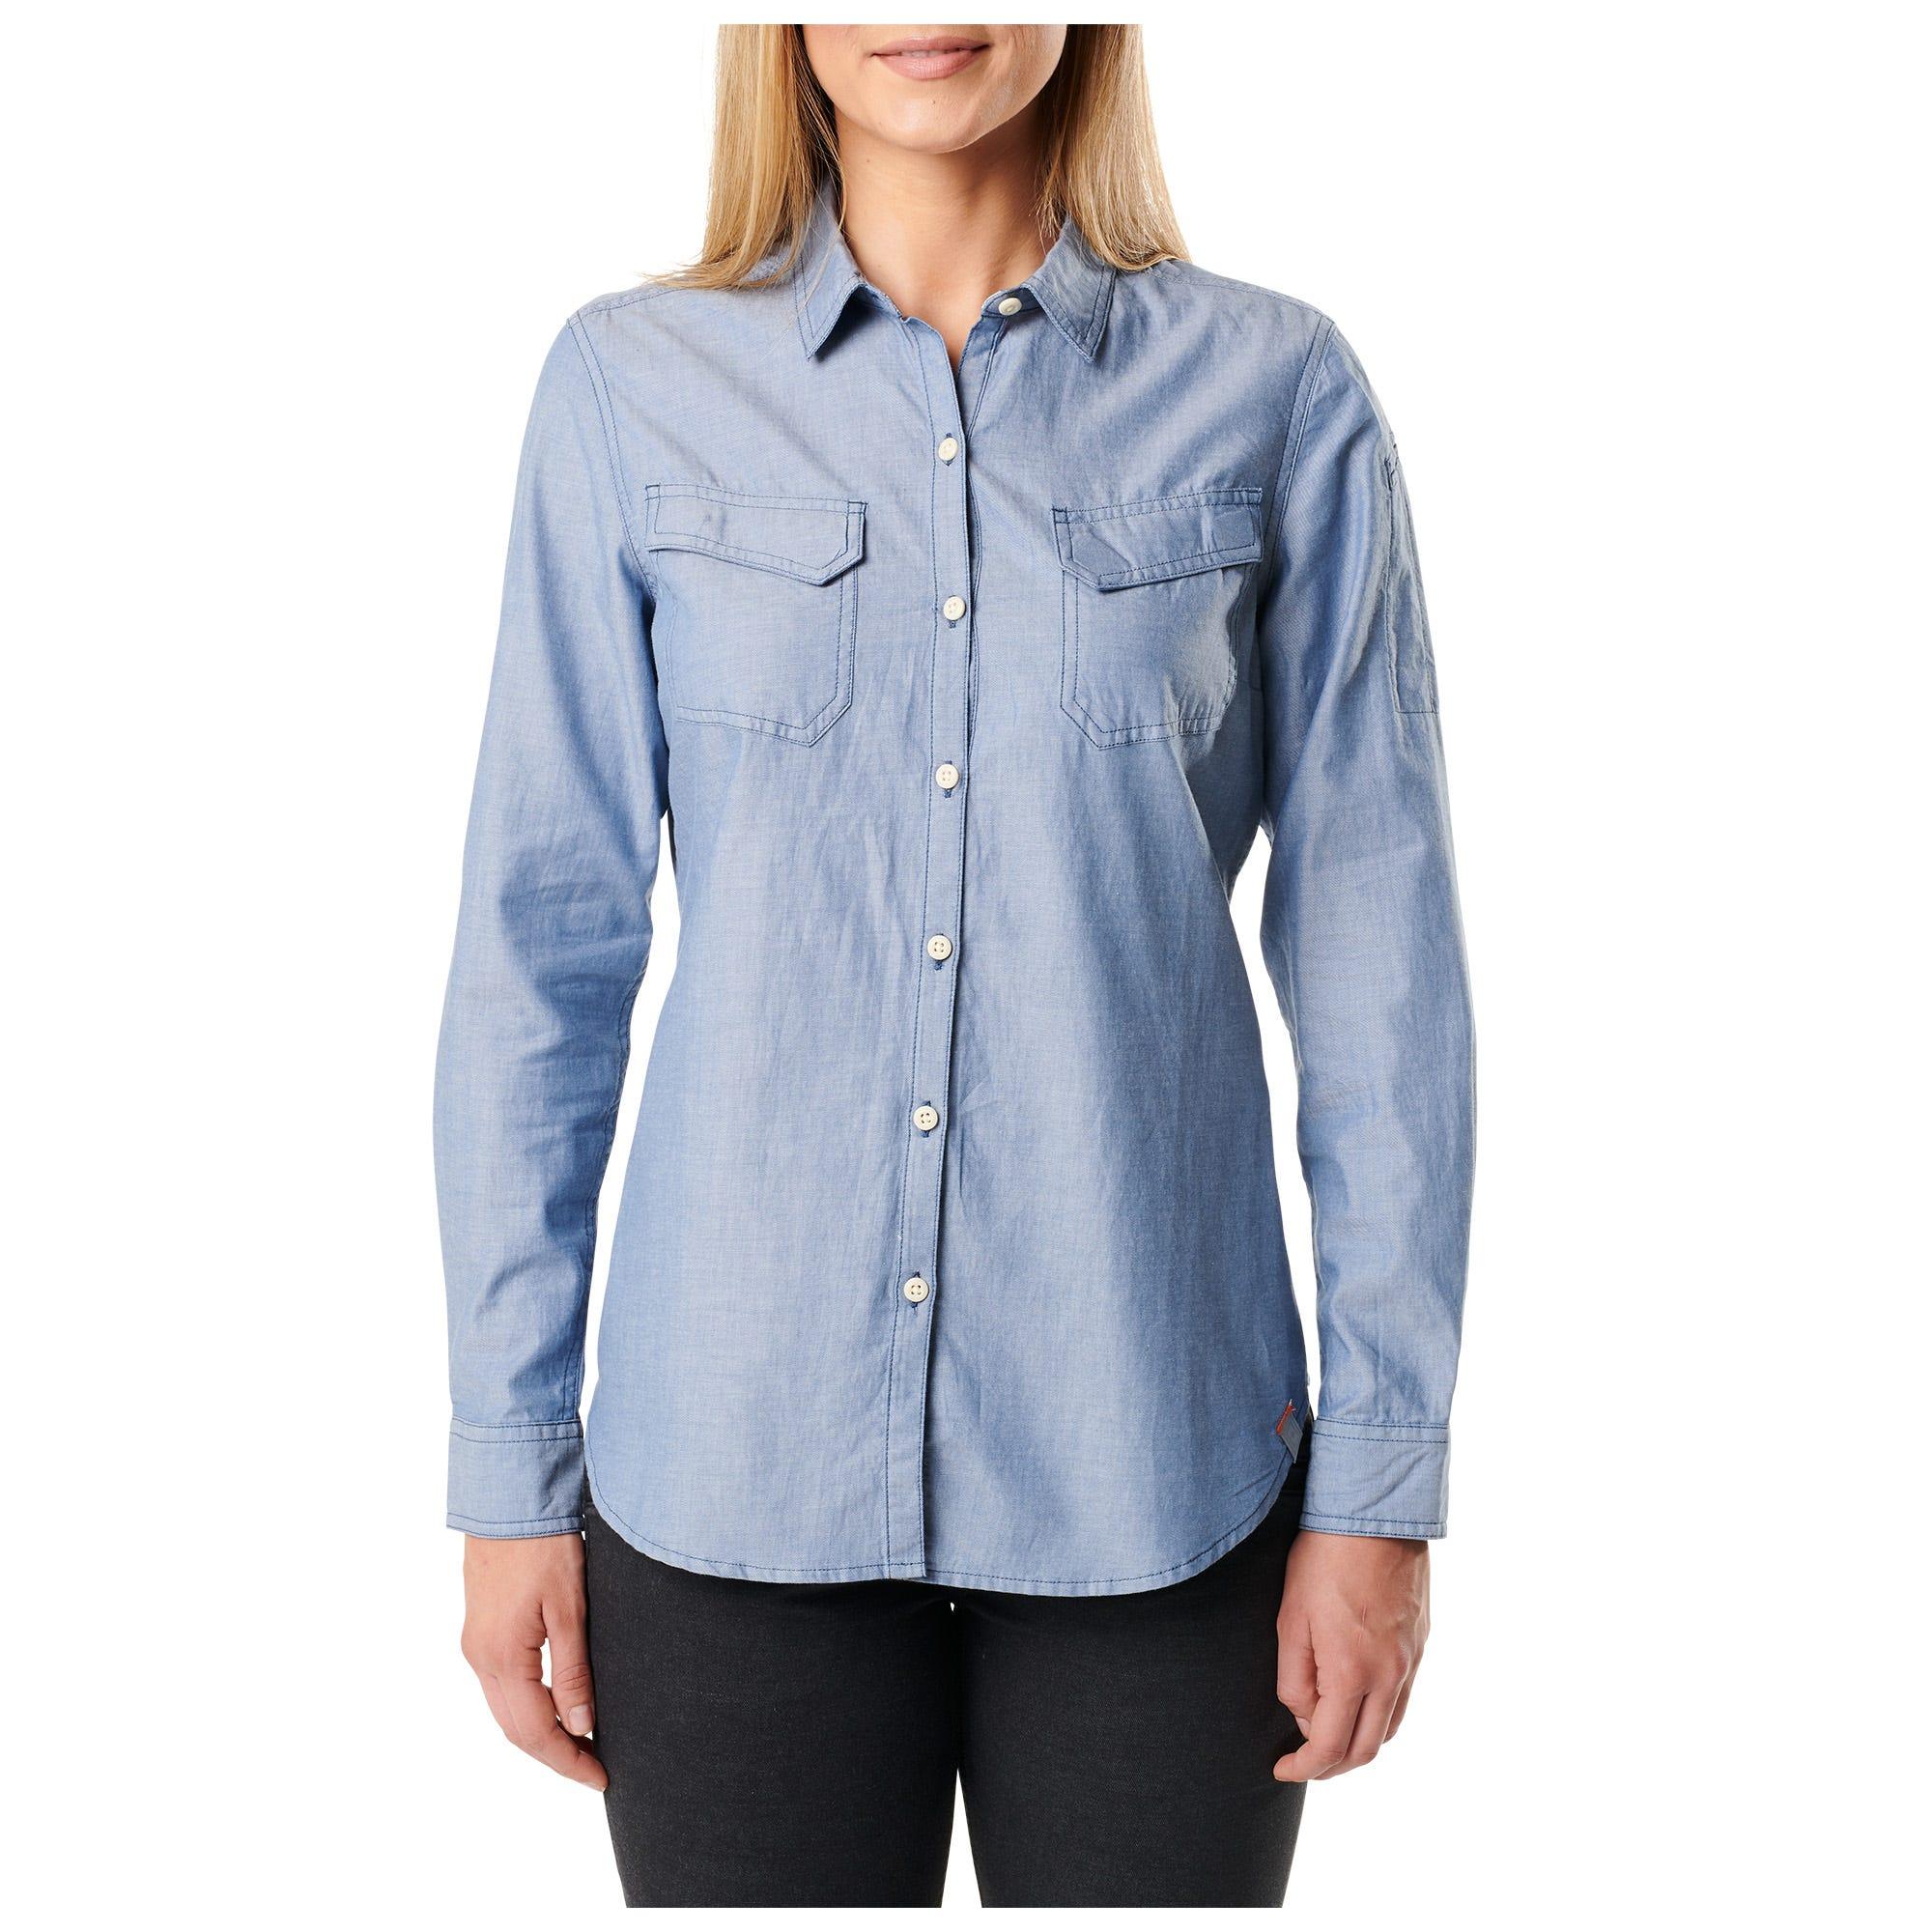 5.11 Tactical Women Women's Chambray Shirt (Blue)